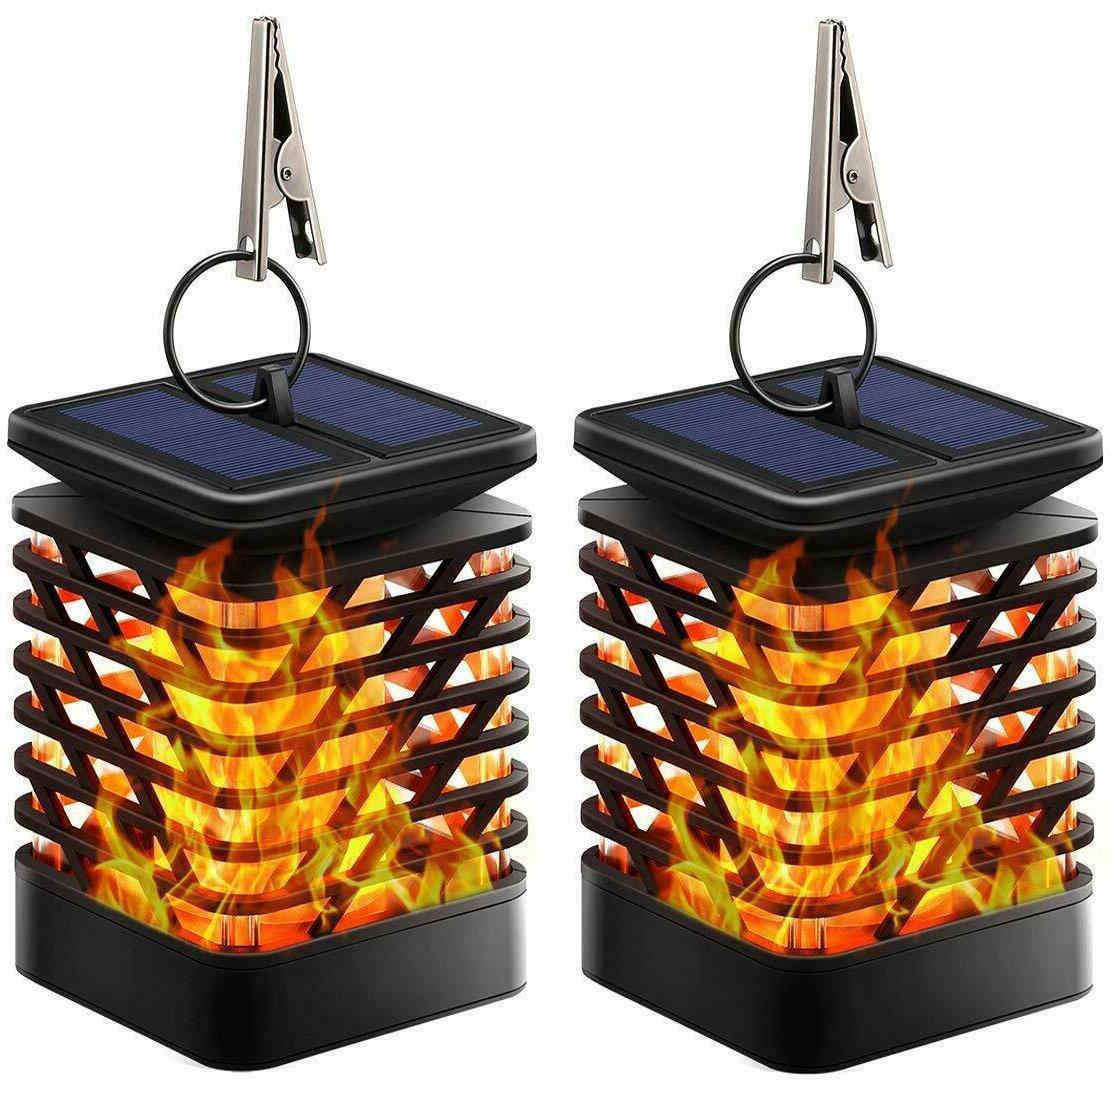 TomCare Solar Lights Solar Lanterns Dancing Flame Outdoor Ha